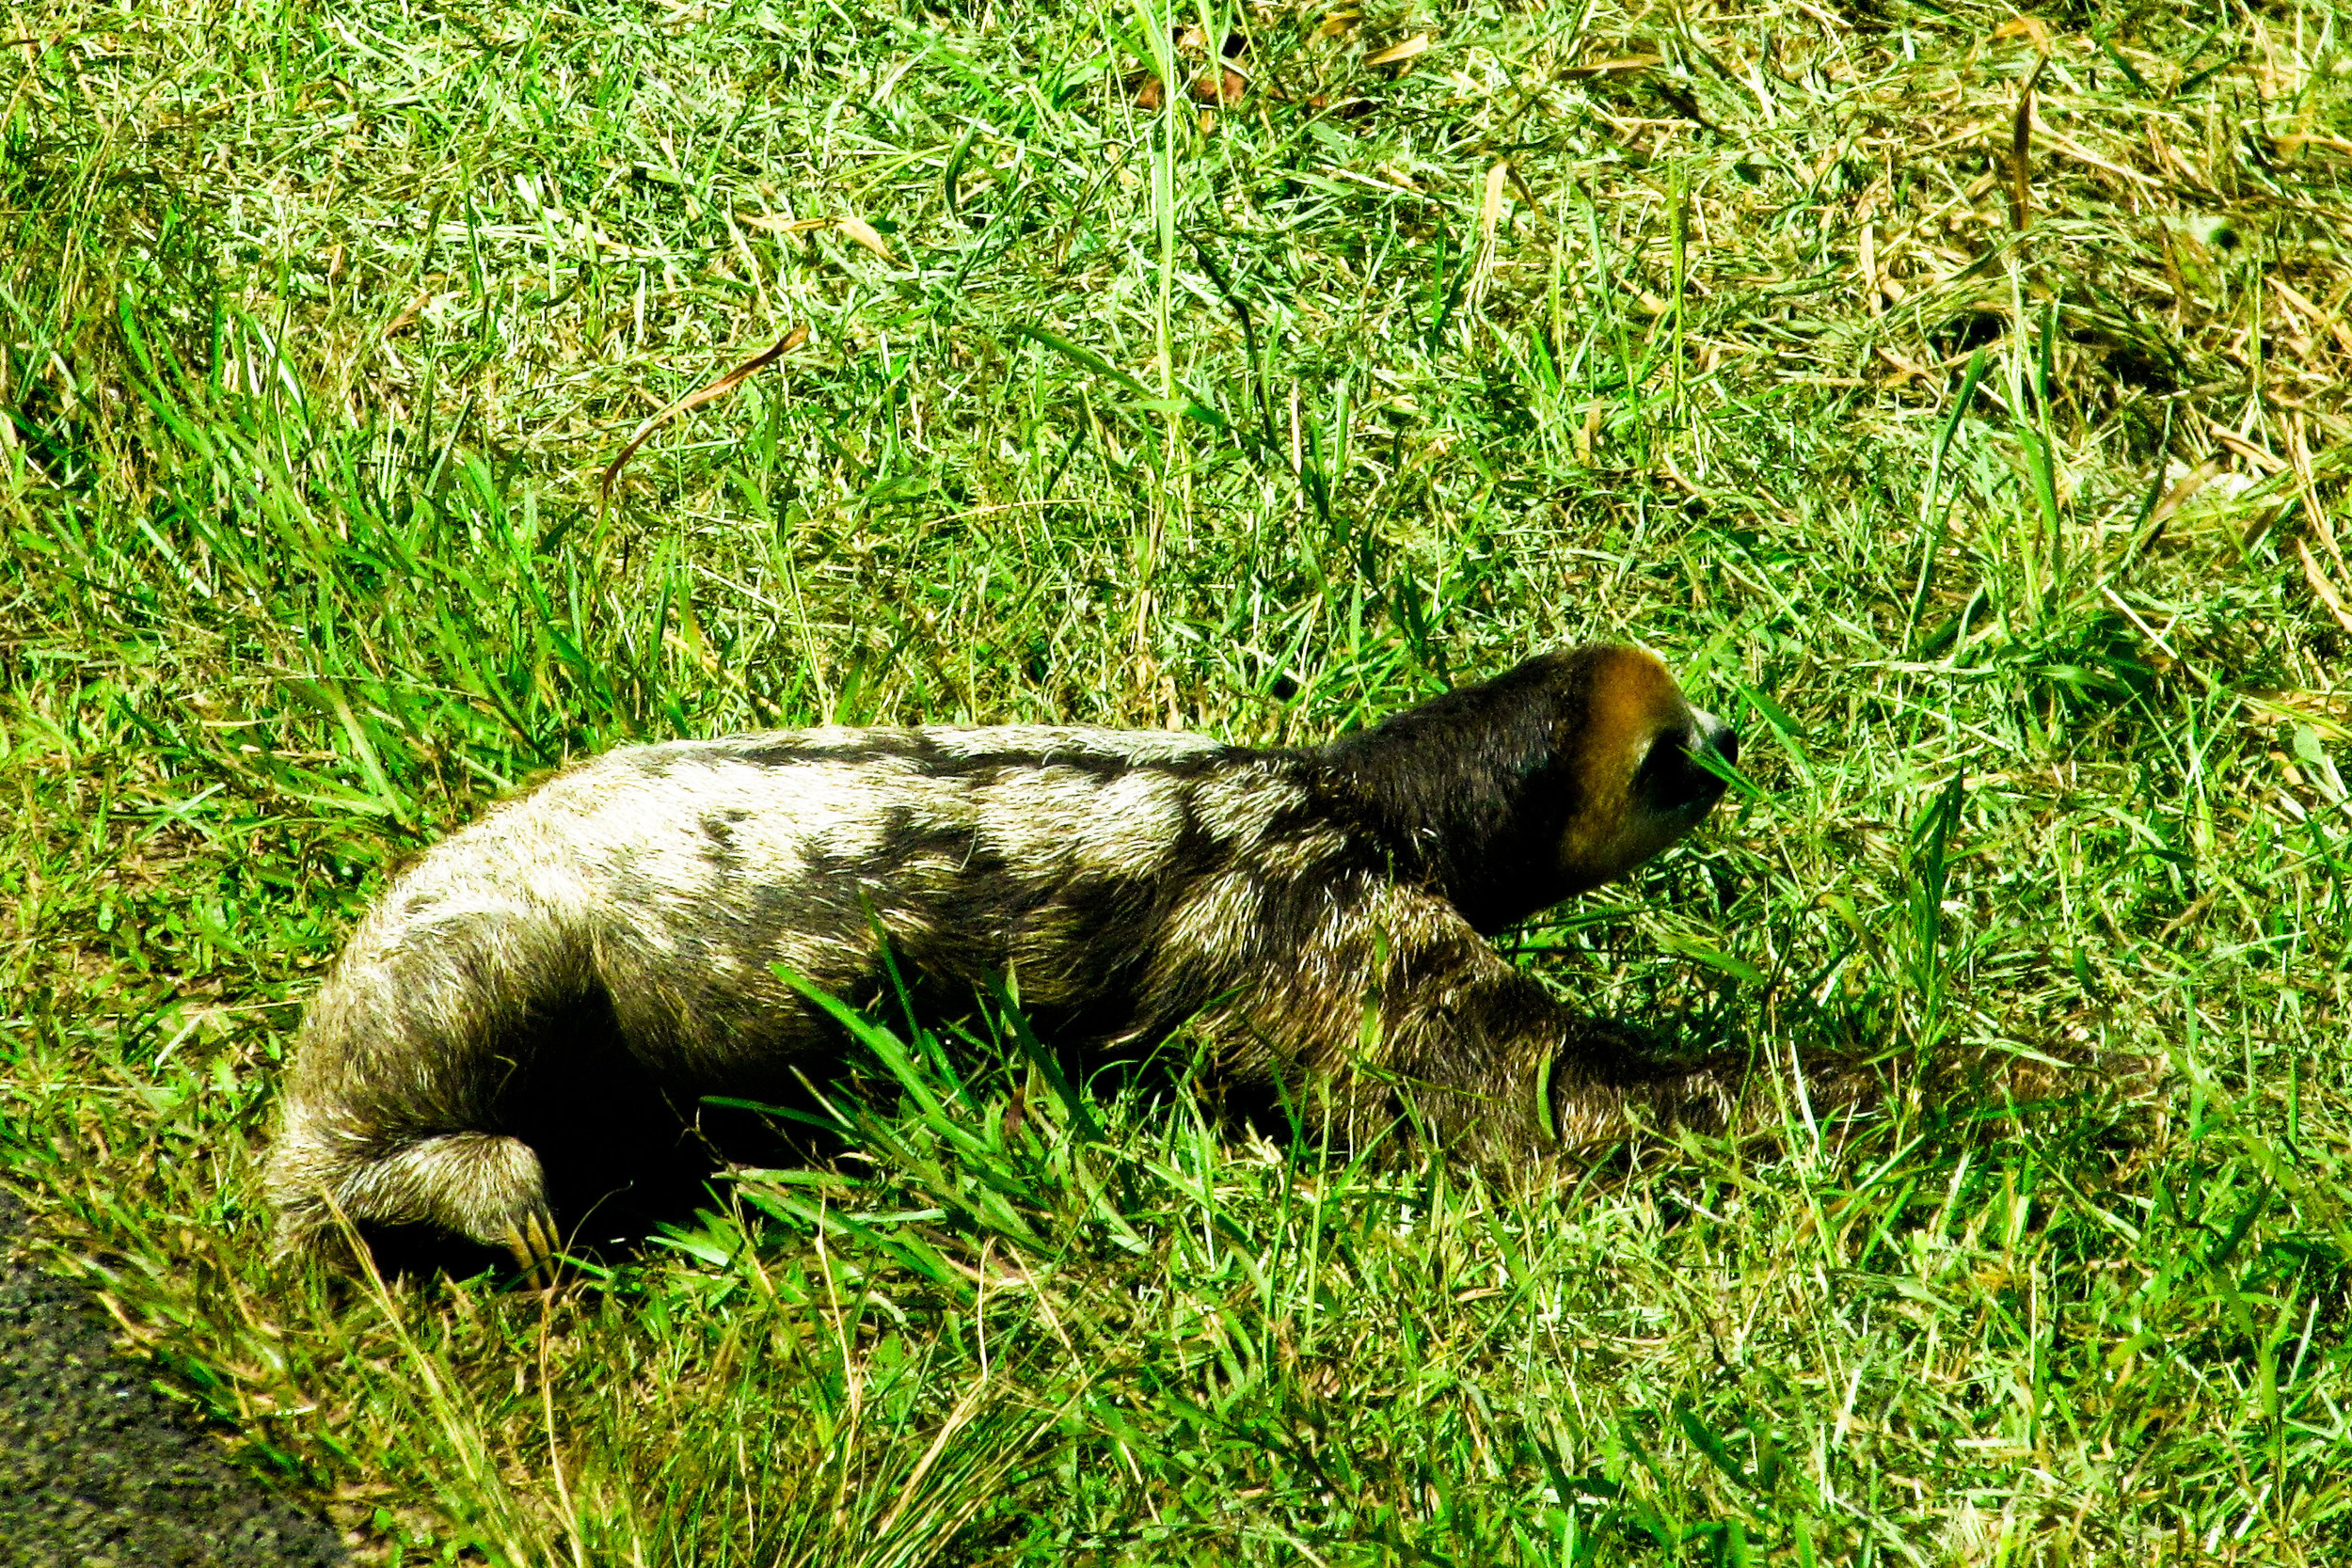 sloth-1155844.jpg